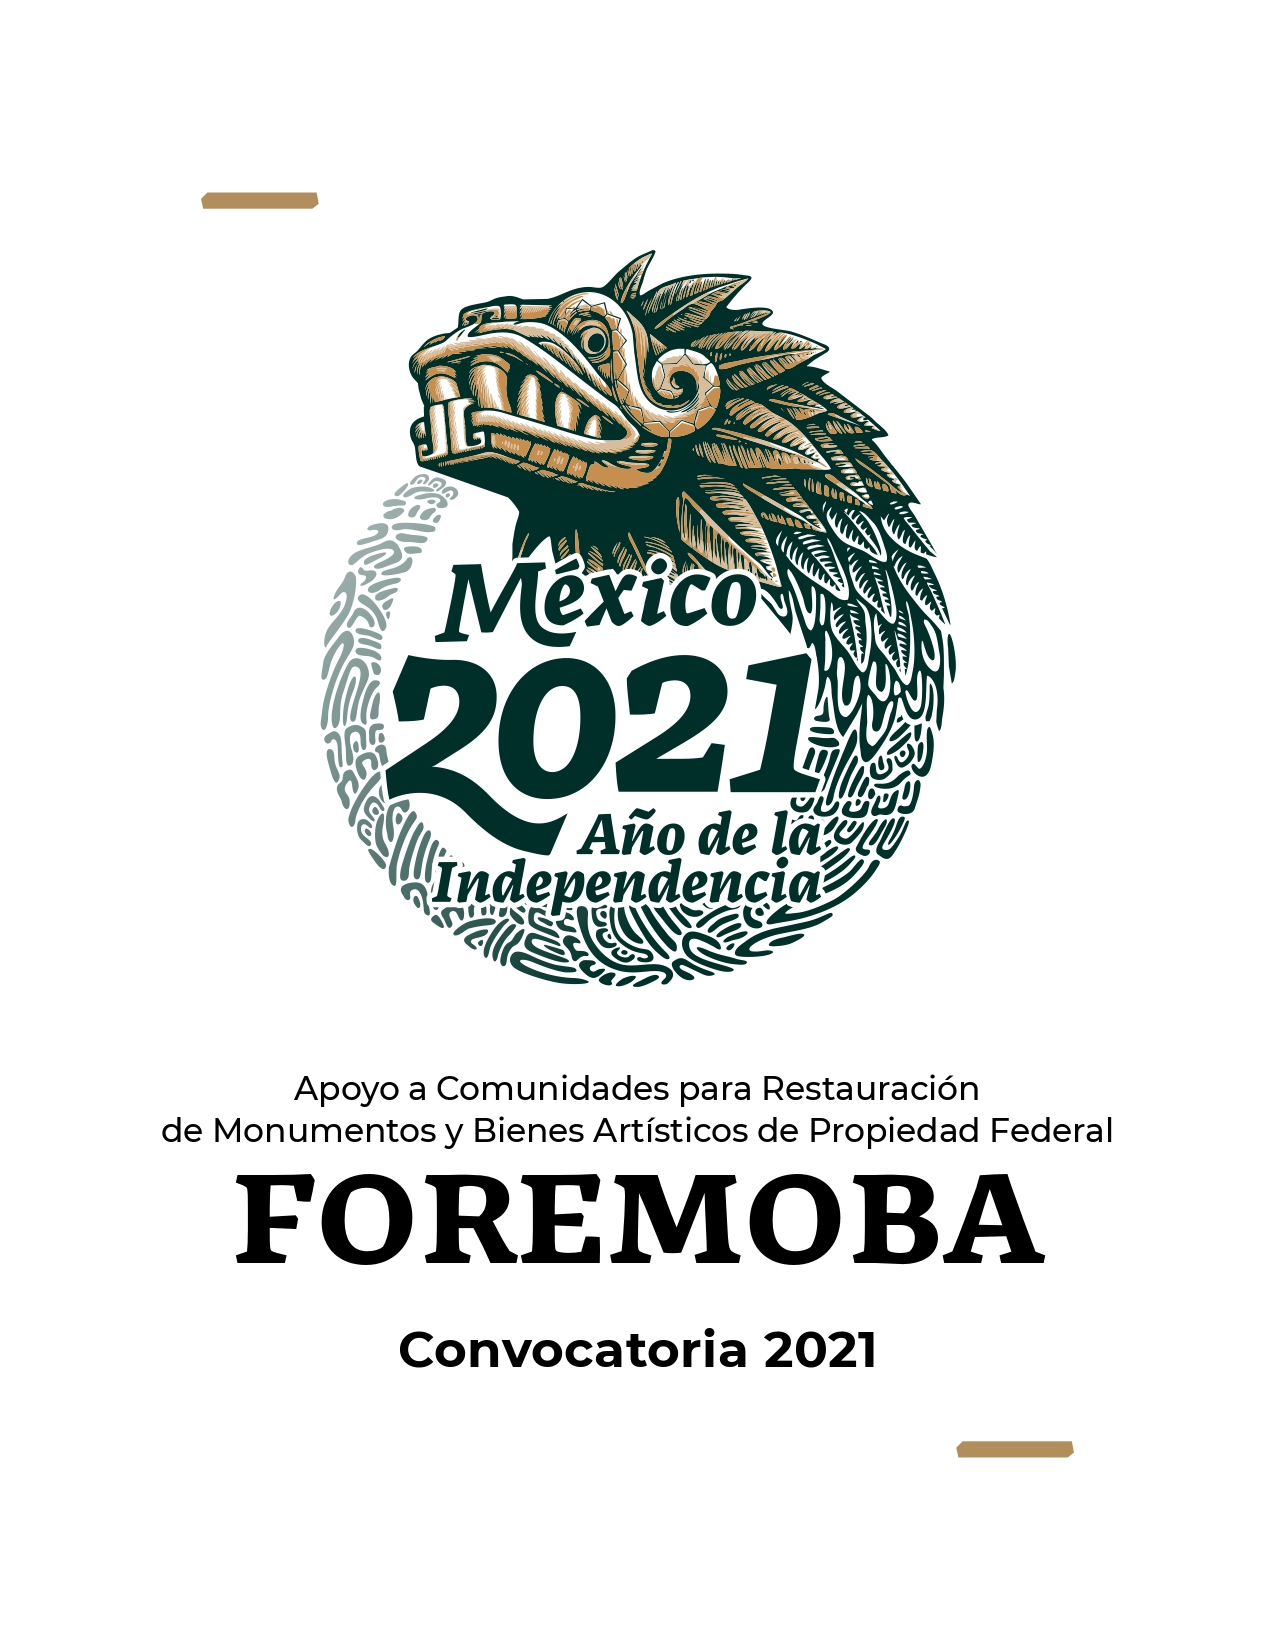 /cms/uploads/image/file/625951/FOREMOBA_2021_page-0001.jpg